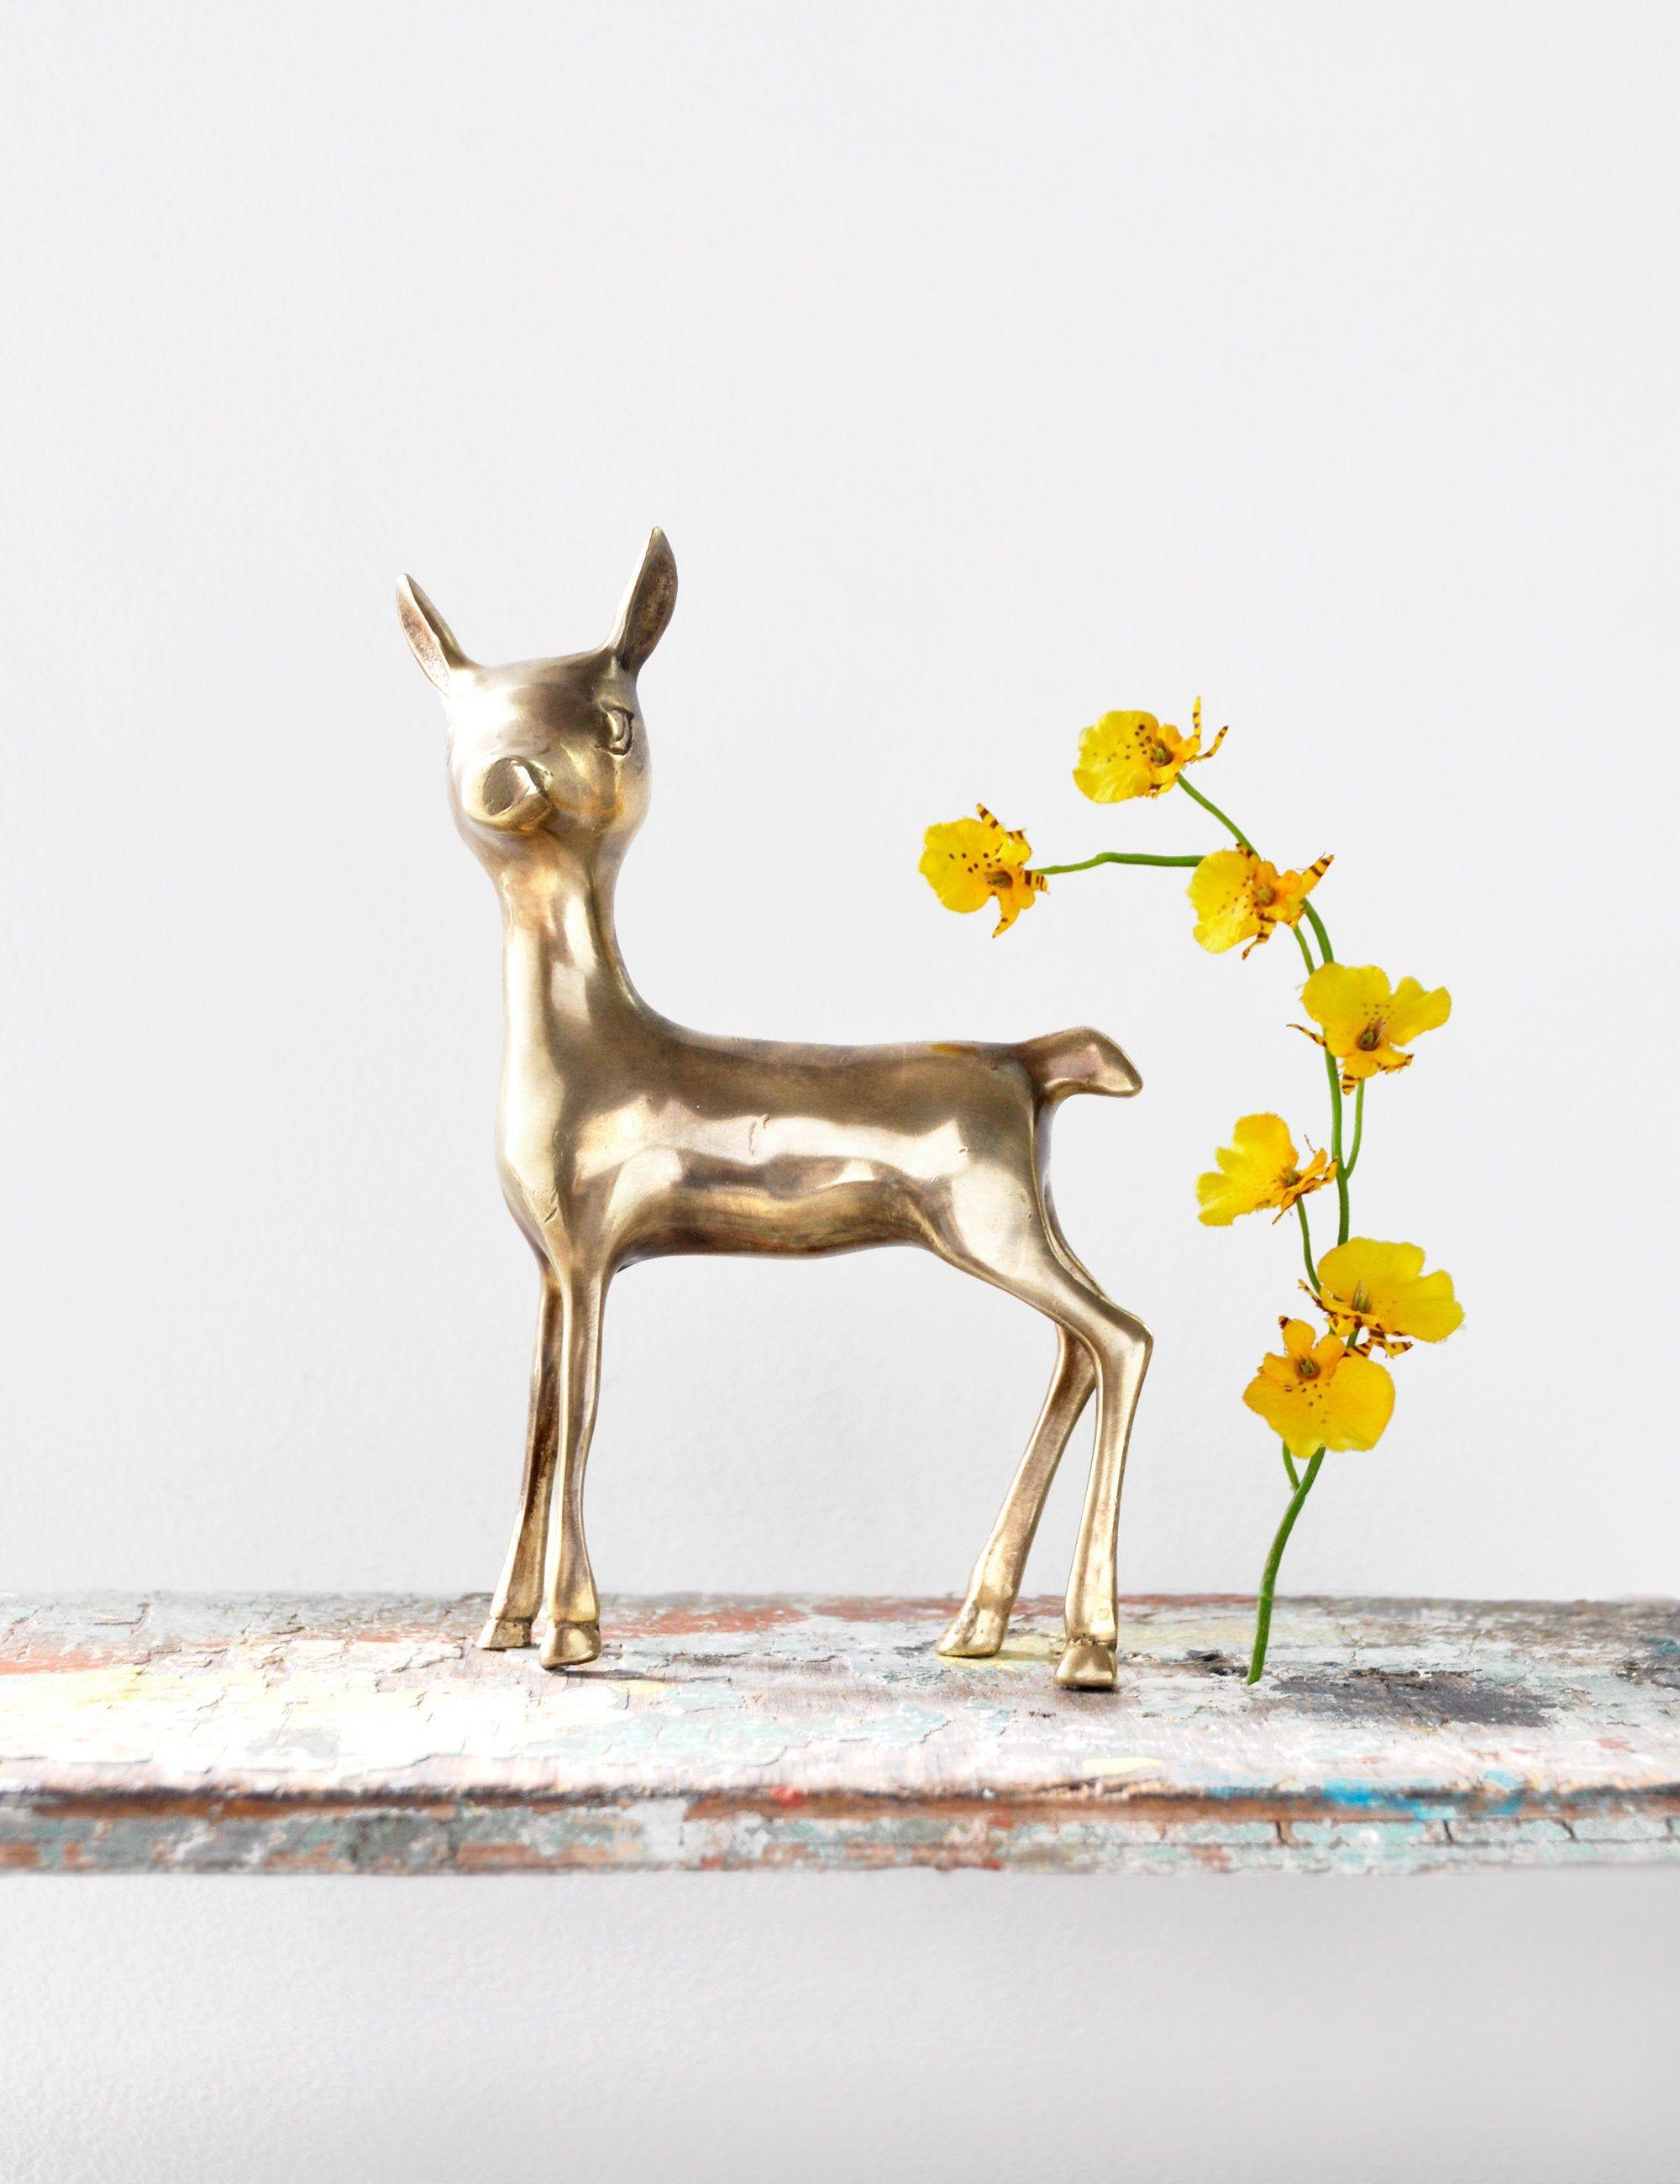 woodland animal home decor vintage brass deer figurine 7 5  bambi fawn doe metal figure  vintage brass deer figurine 7 5